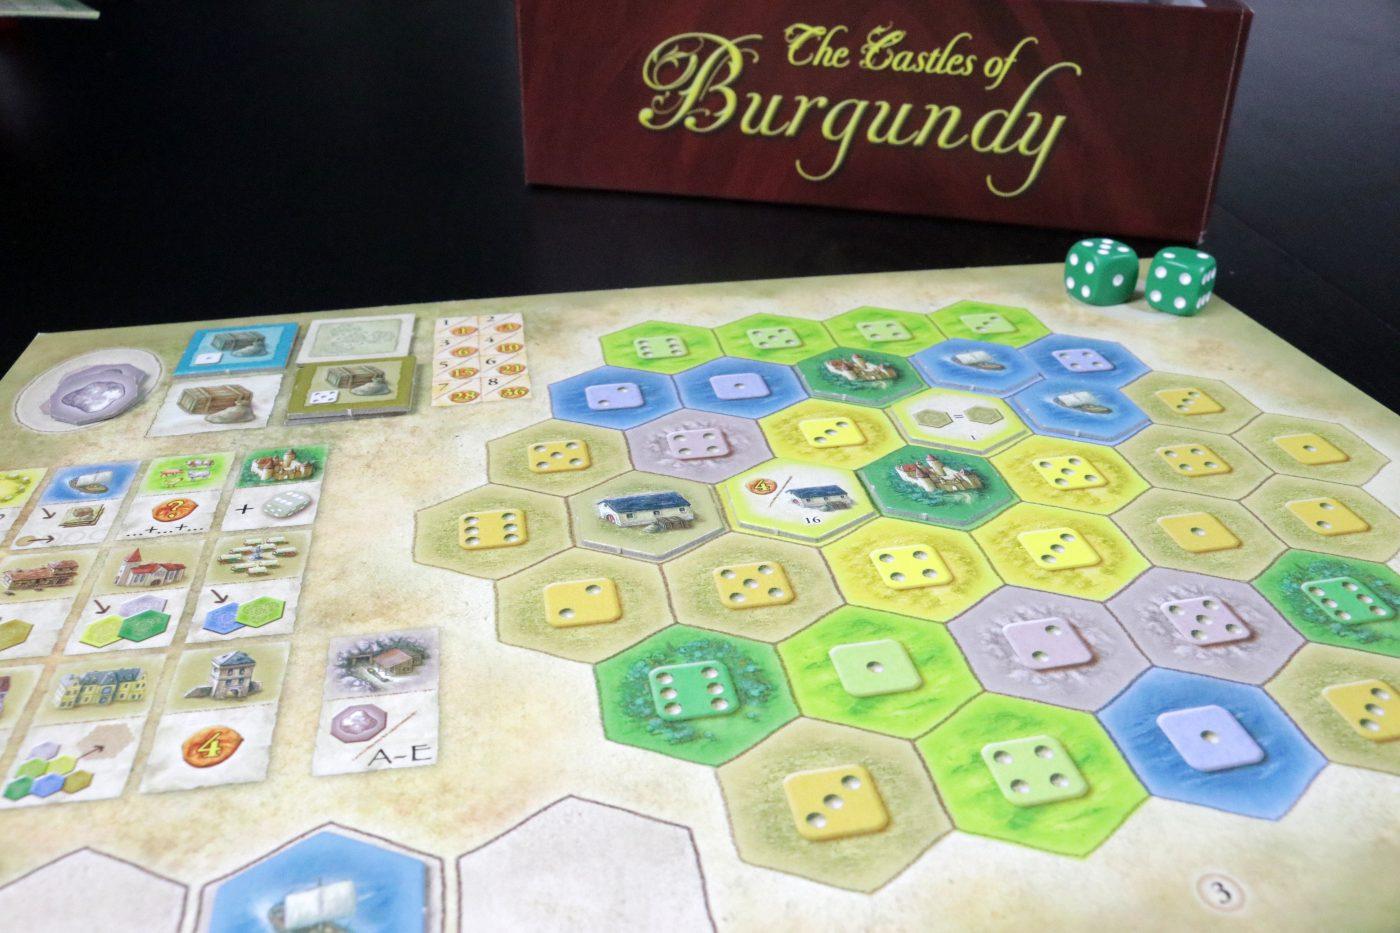 Castles of Burgundy player board